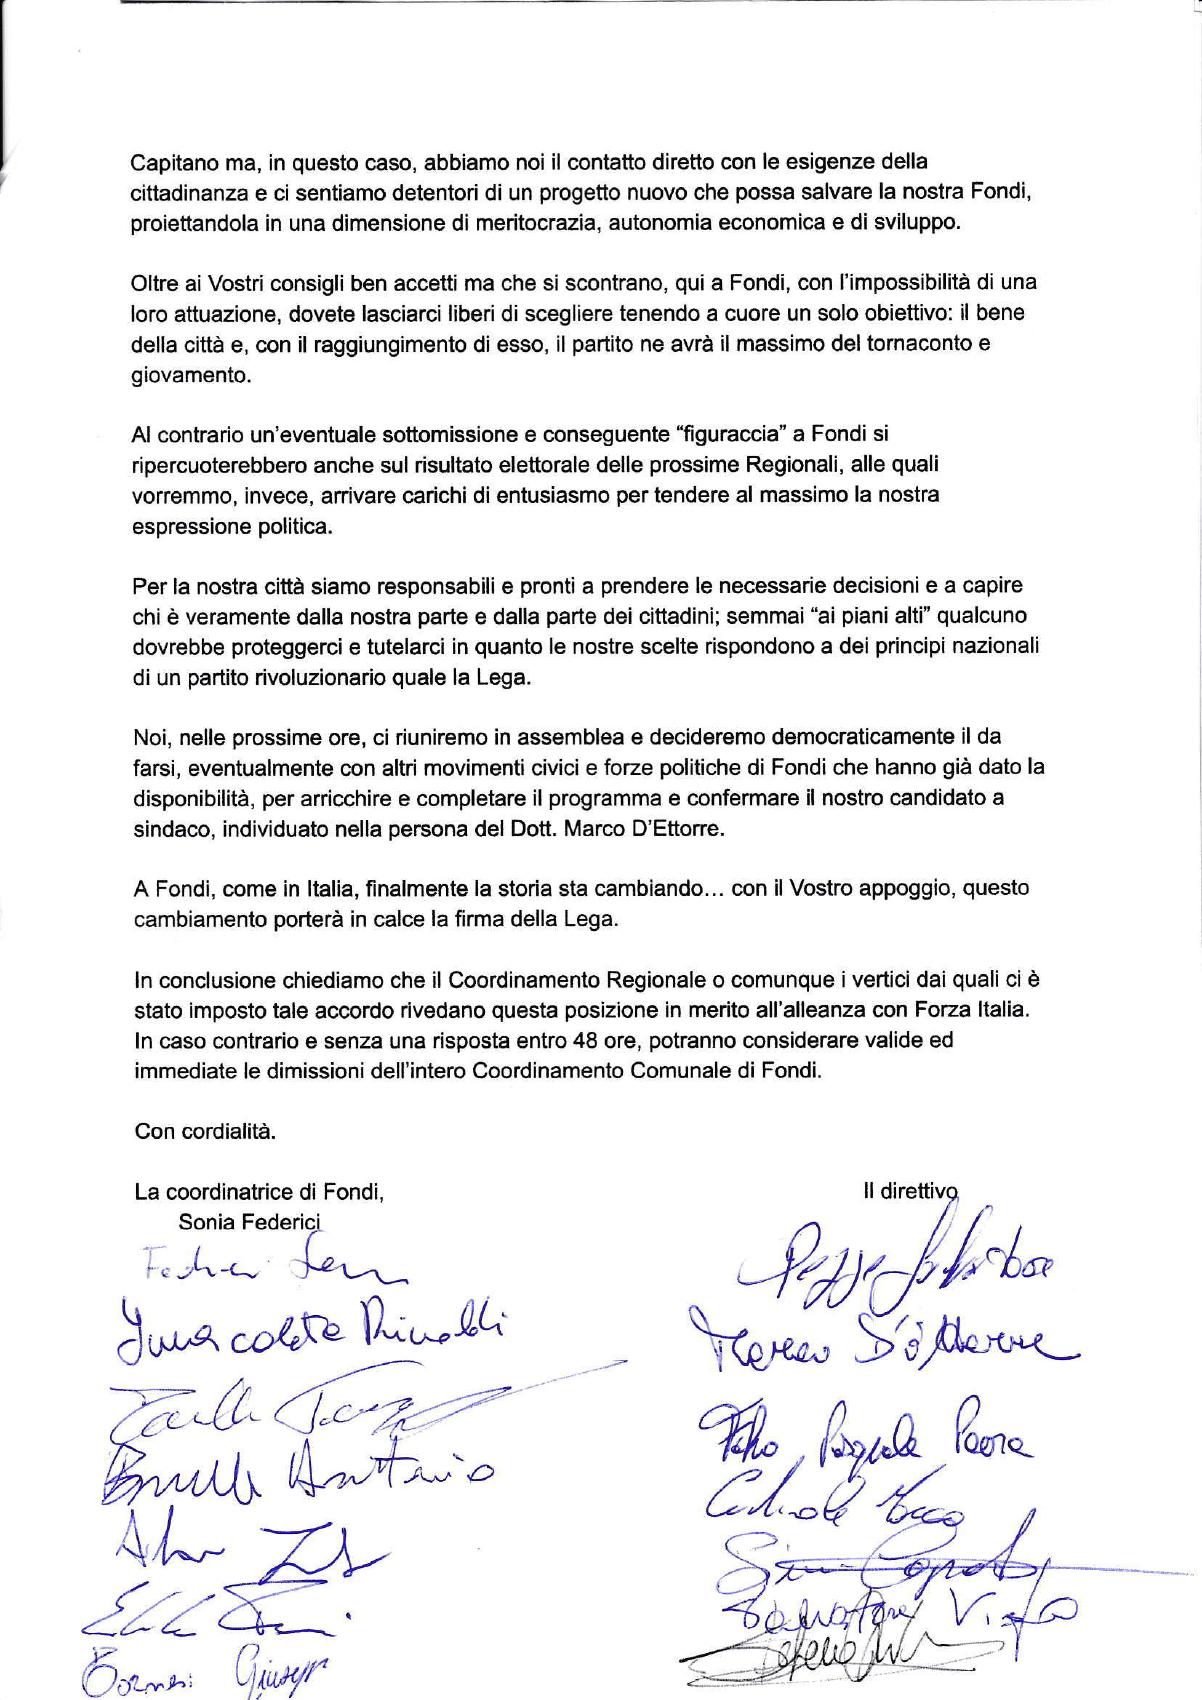 DIMISSIONI LEGA FONDI - PAG 3 con firme